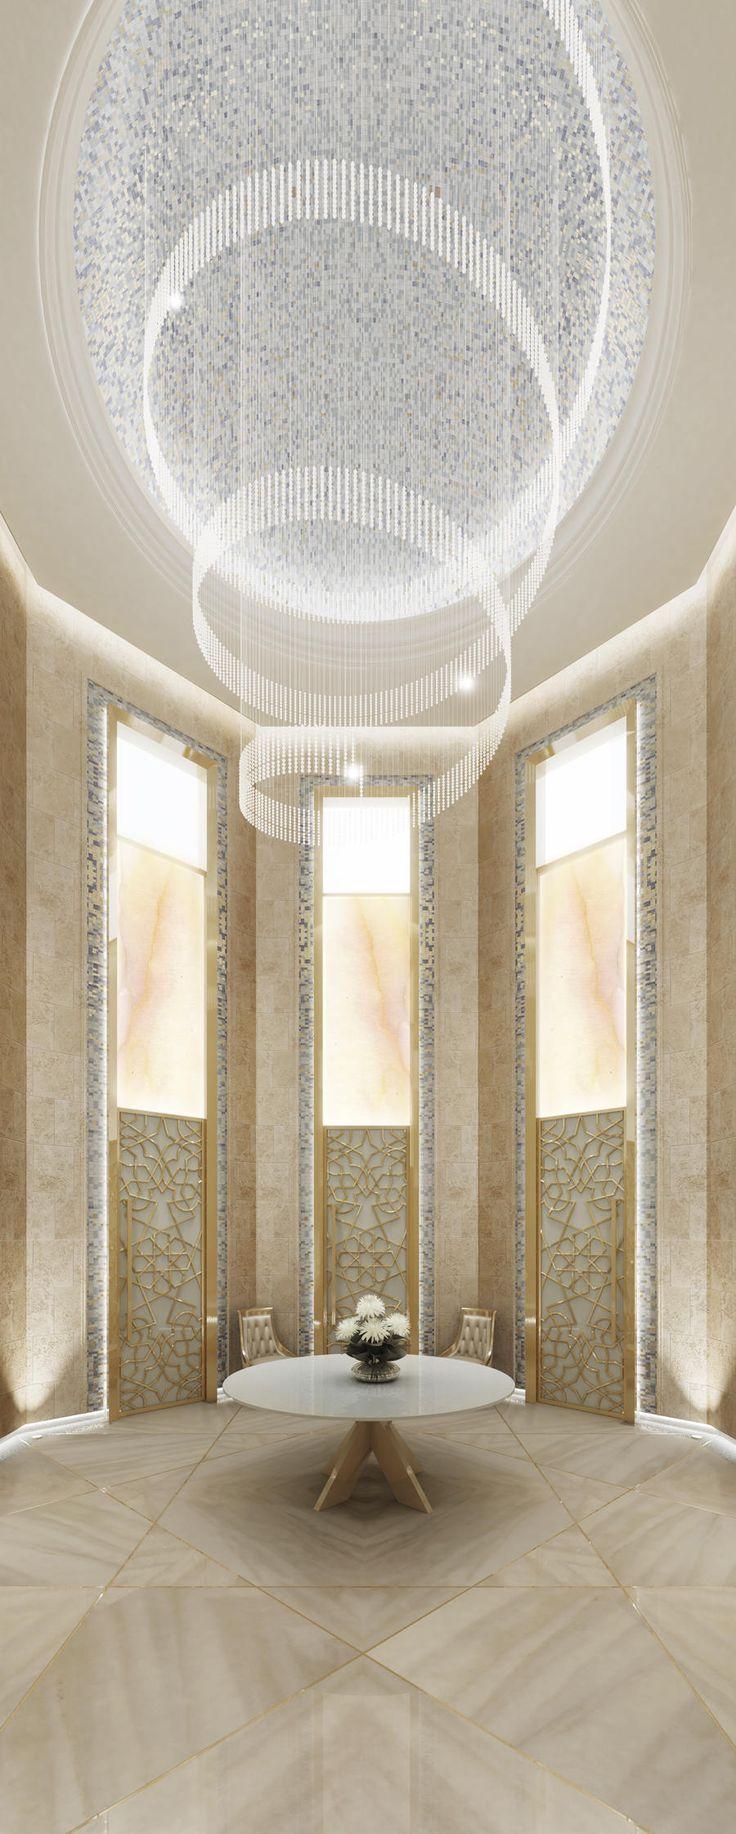 17 best images about my dubai interior design on for Indoor design dubai